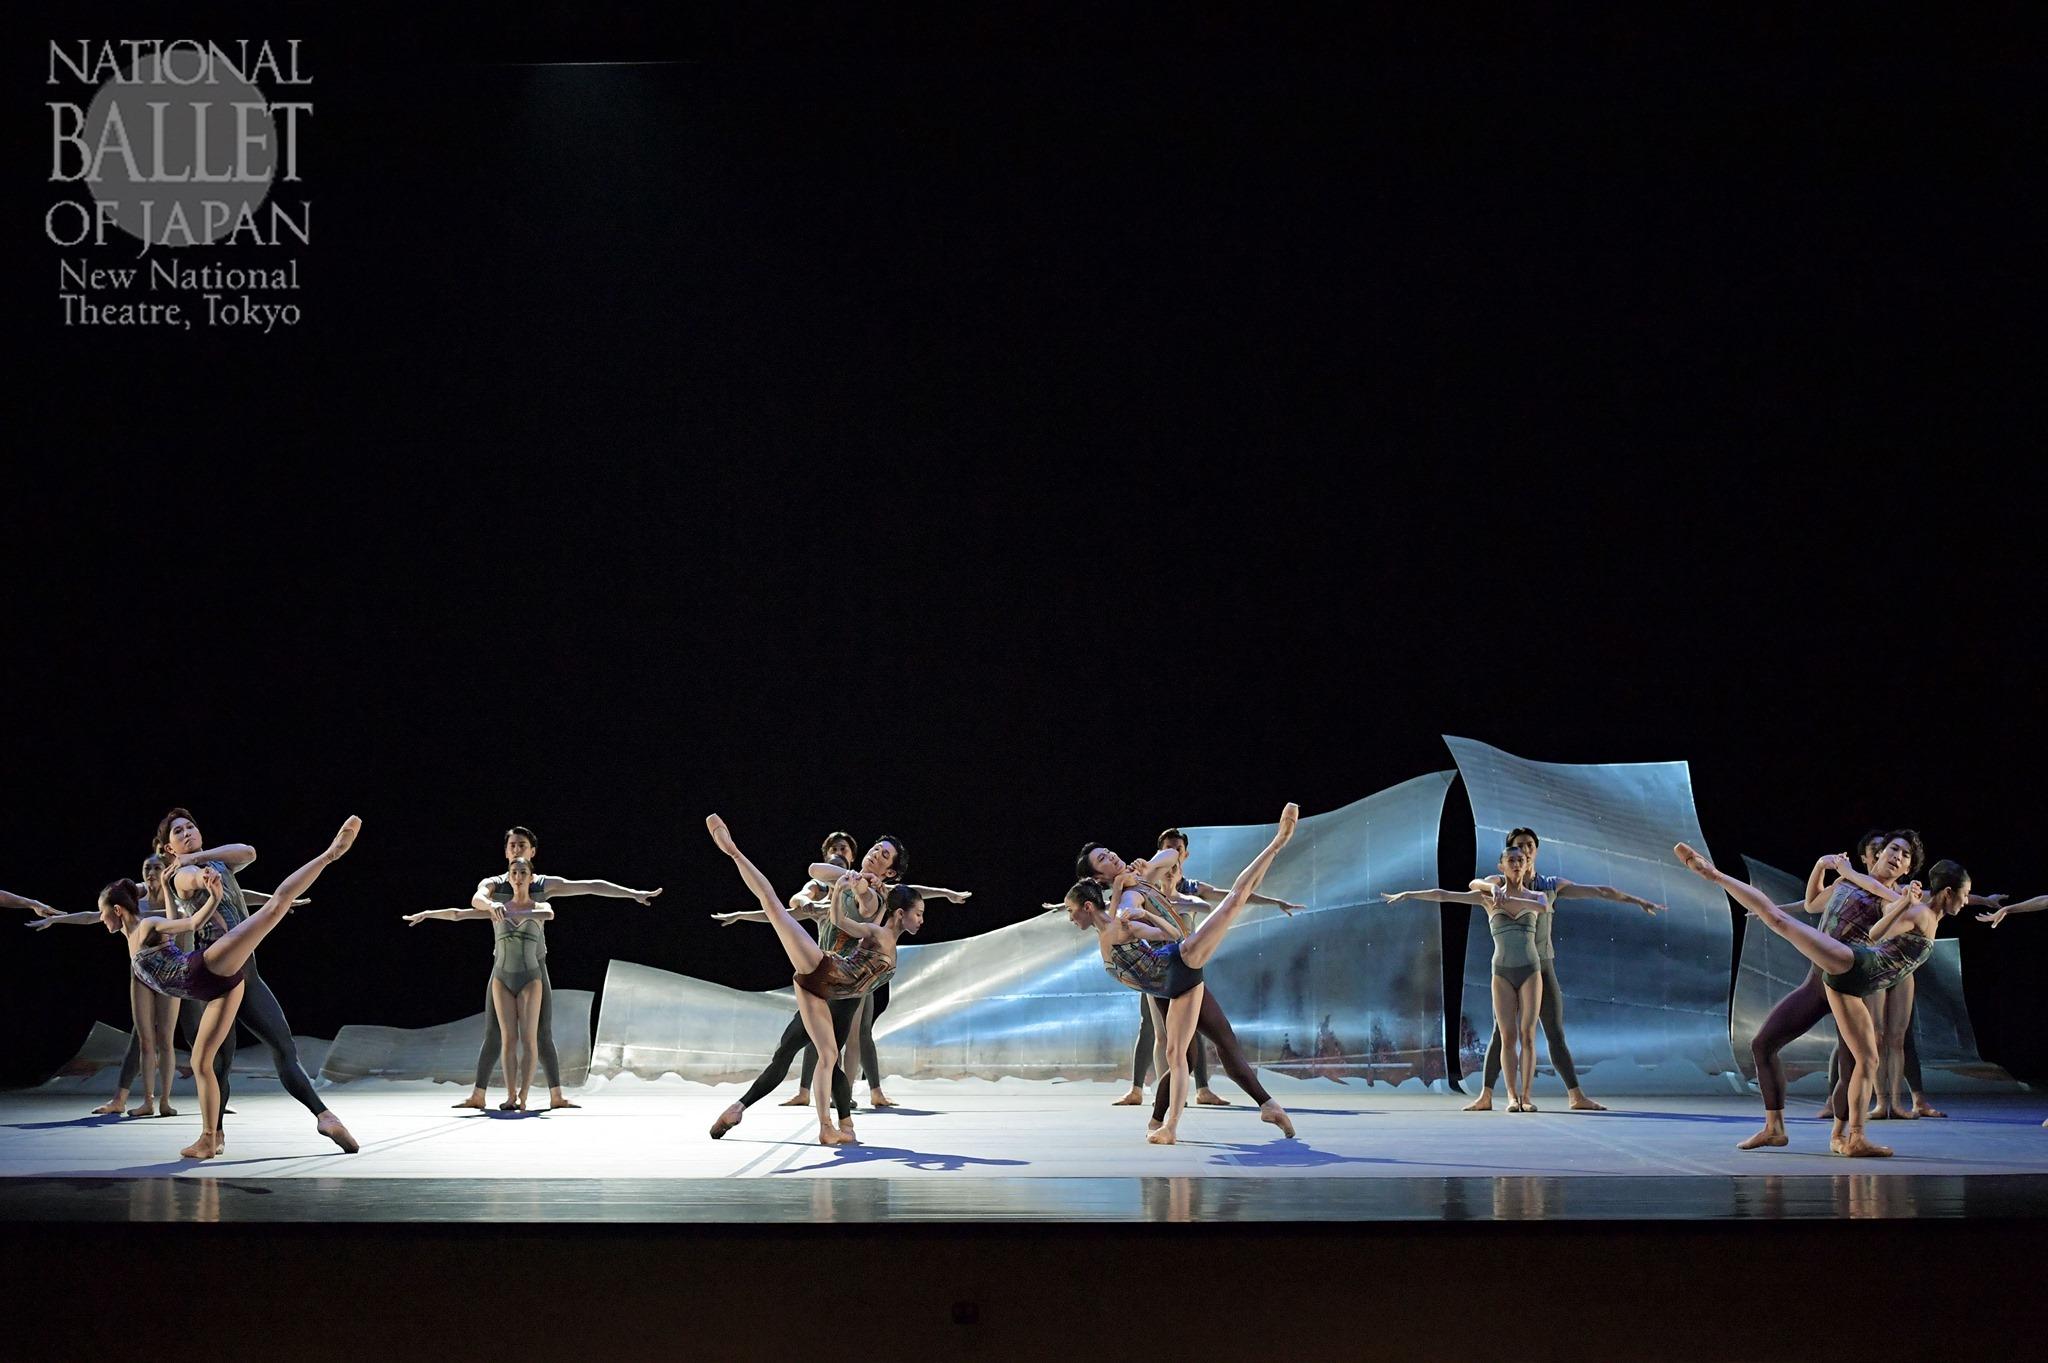 『DGV Danse à Grande Vitesse ©』(撮影:鹿摩隆司/写真提供:新国立劇場)